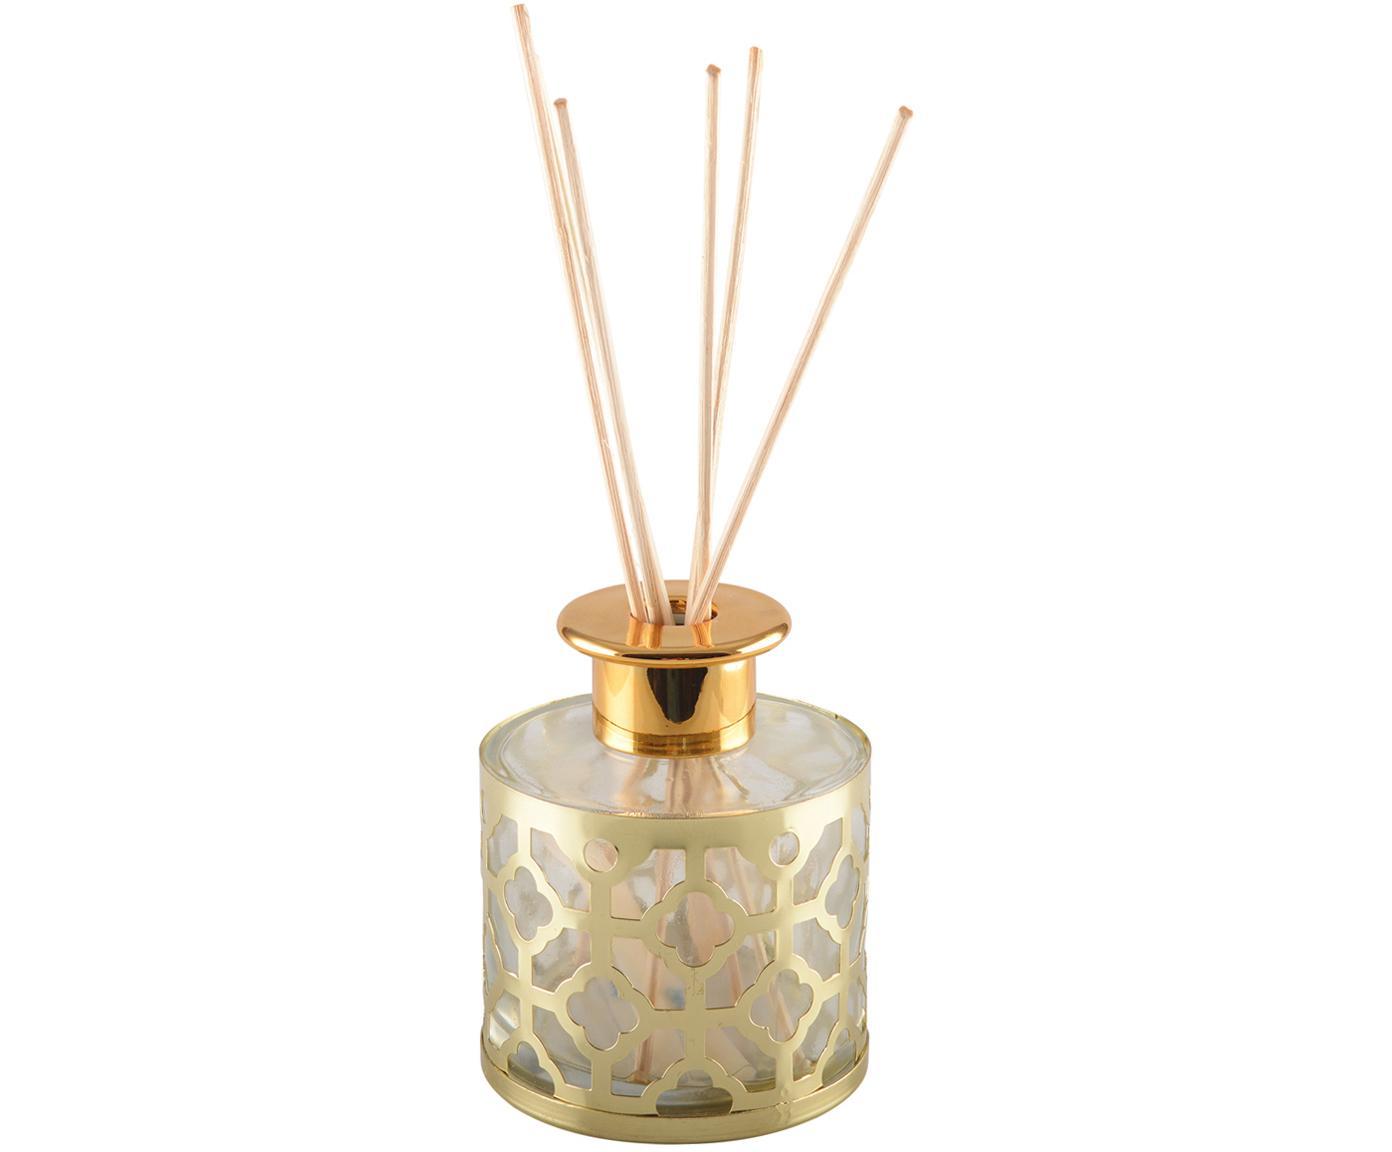 Diffuser Helion (vanille), Goudkleurig, transparant, Ø 9 x H 24 cm